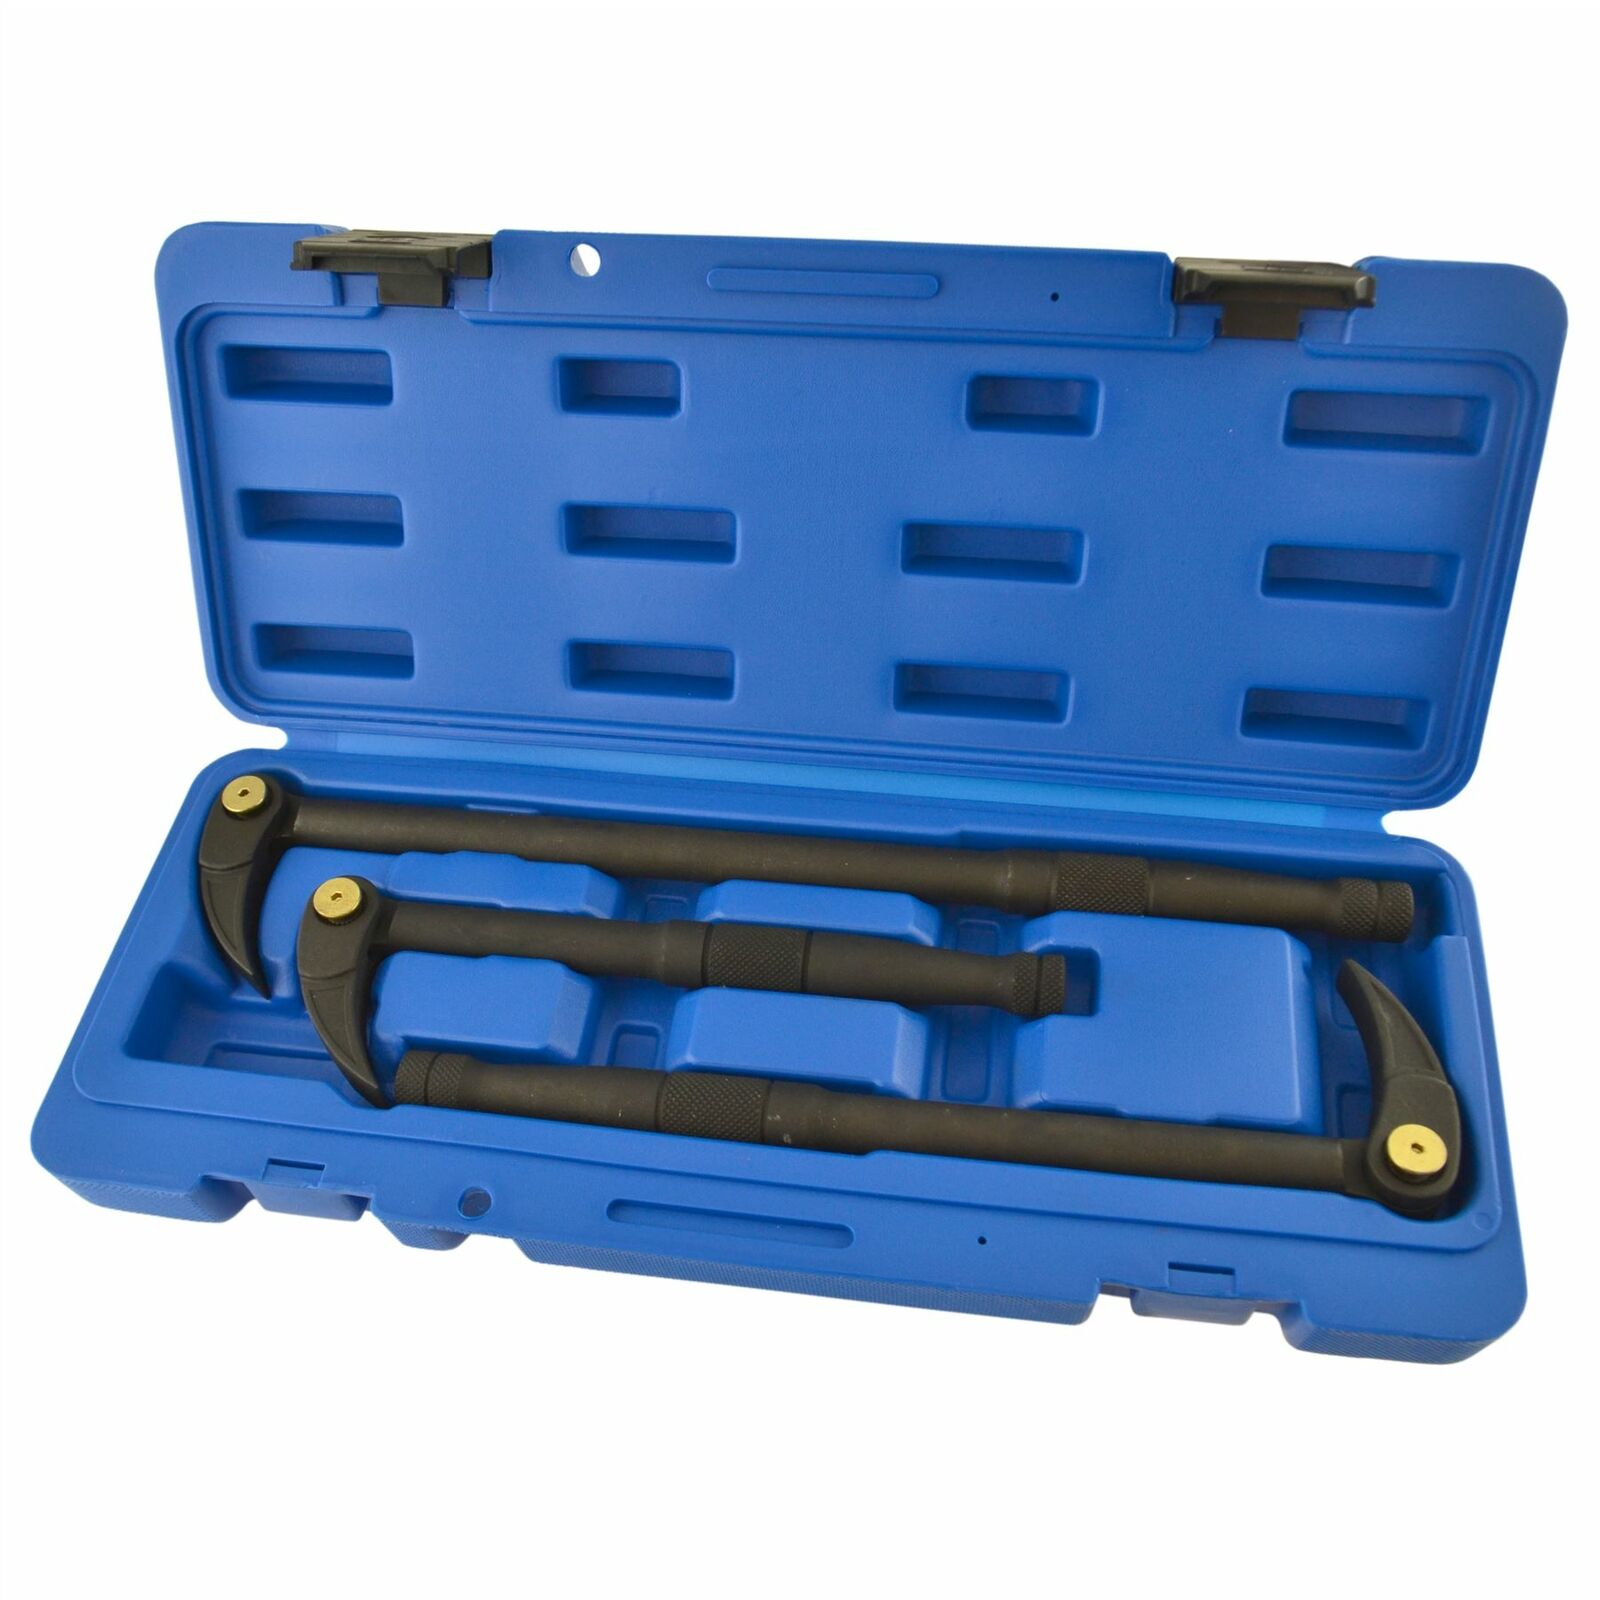 3pc Adjustable Pry Bar 10  12  15  Locking Crow Wrecking Bar Angle Foot TE855